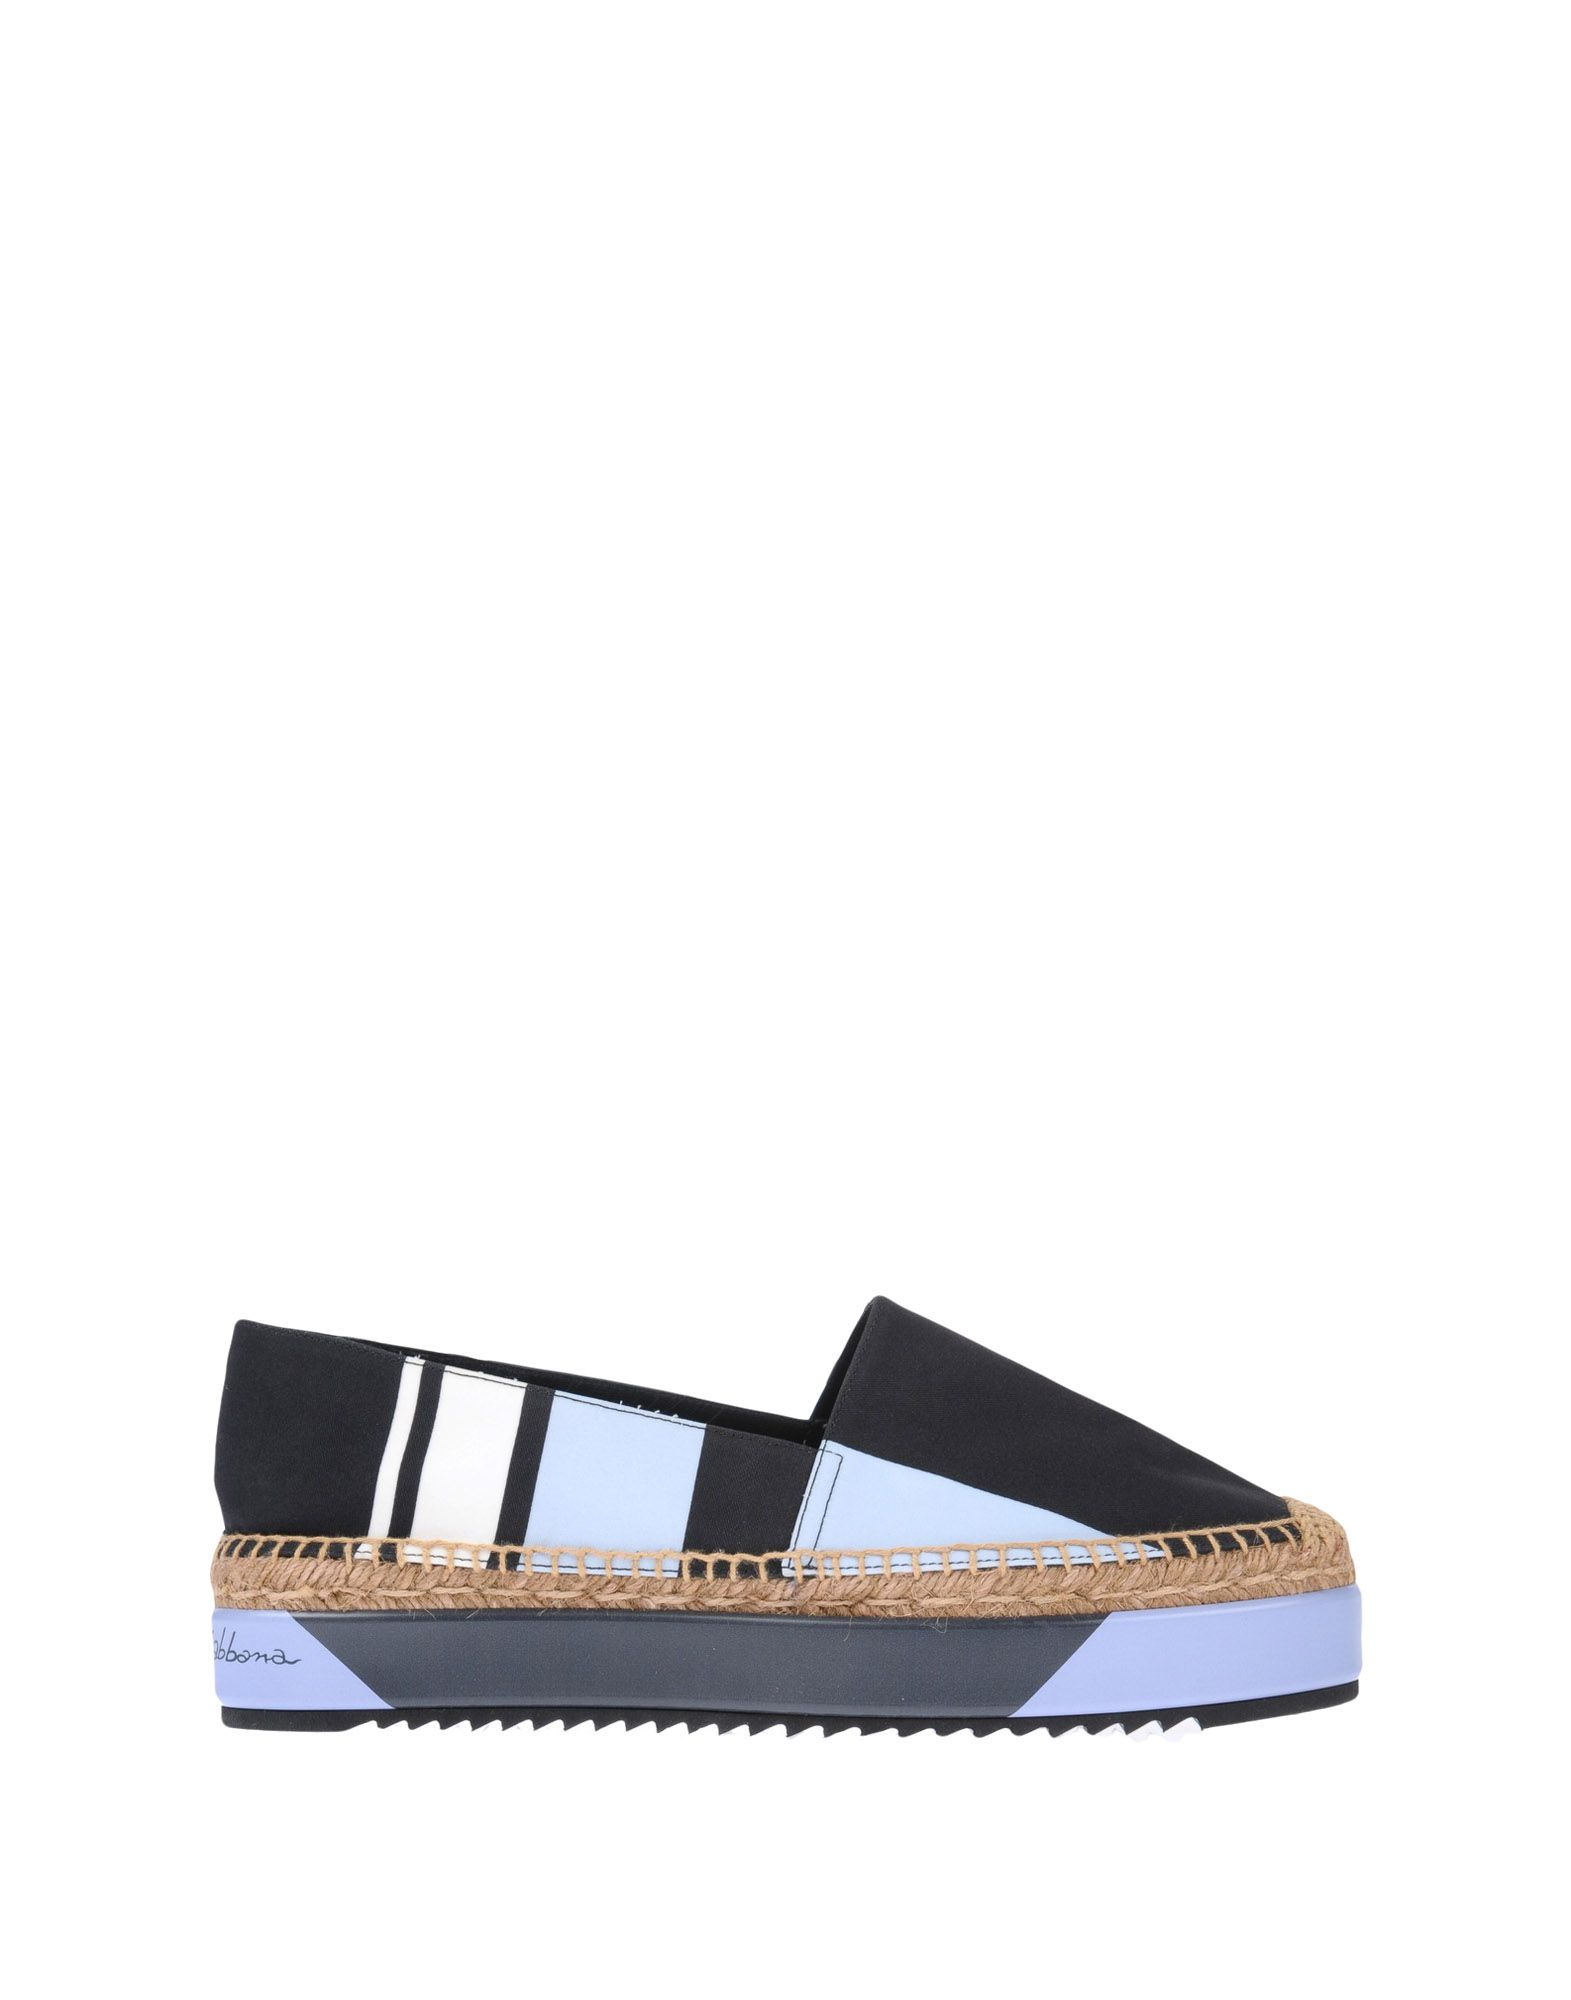 Dolce & Gabbana Espadrilles Espadrilles Gabbana Damen  11487875PW Neue Schuhe 6f9d9b